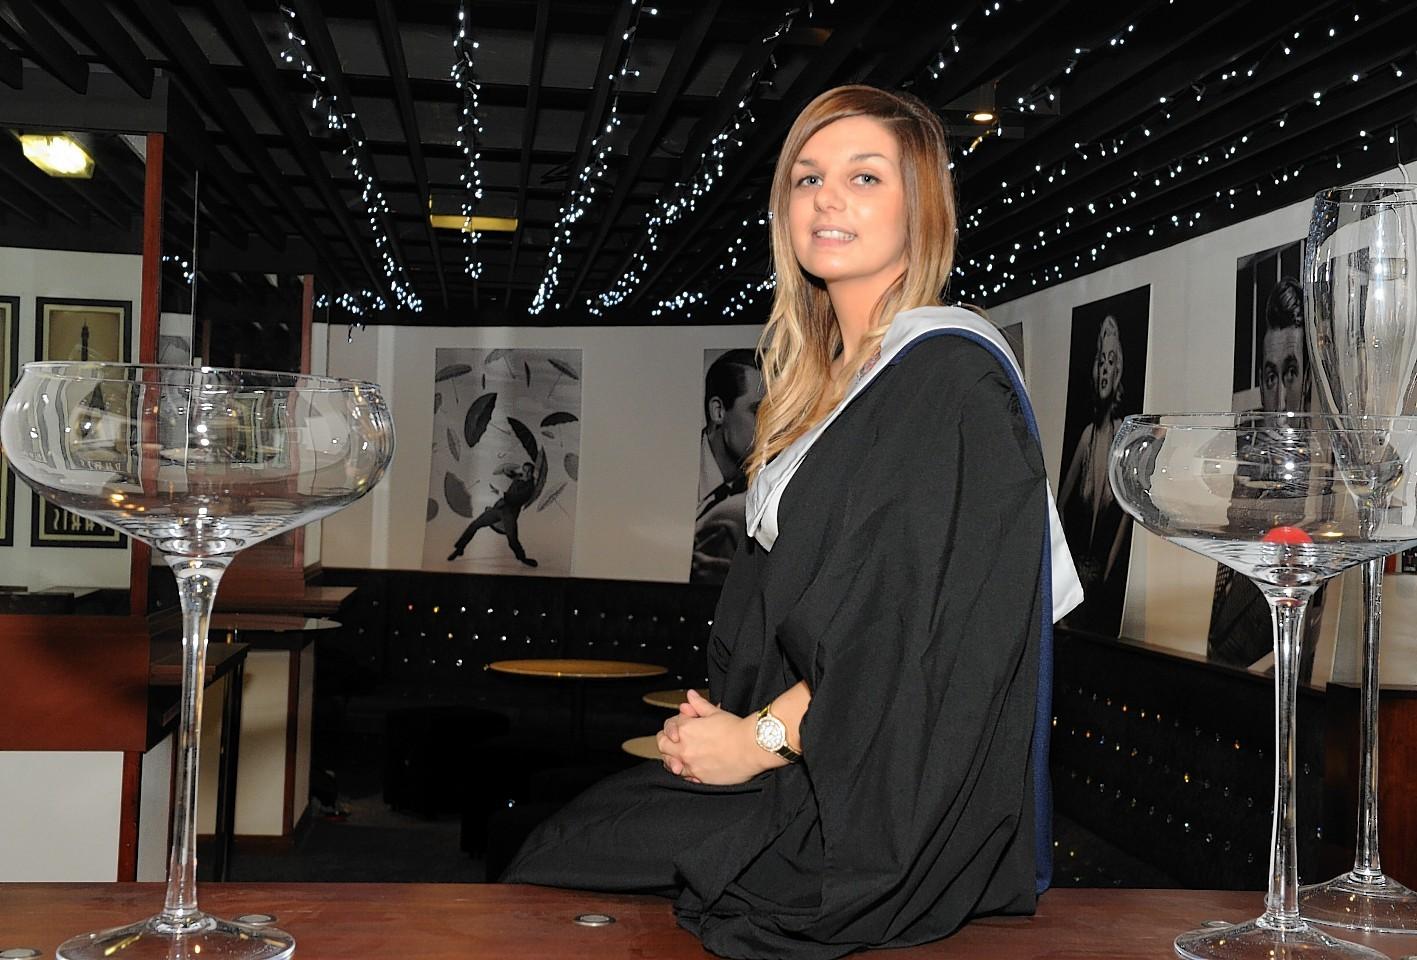 NESCol graduate Chloe Smith